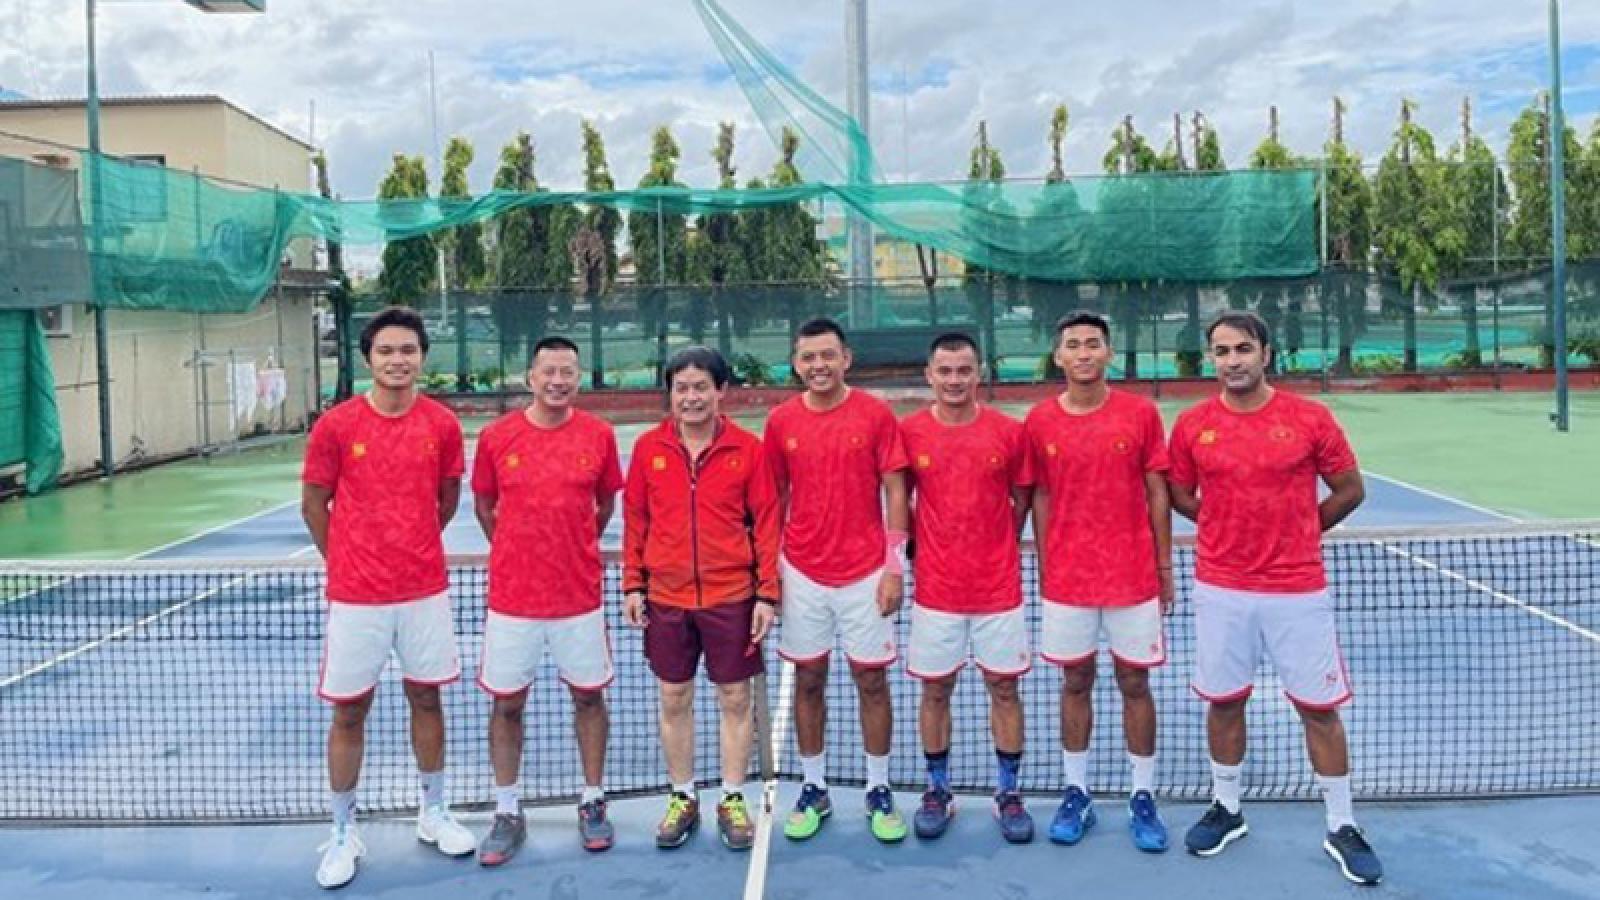 Vietnam win berth for 2022 Davis Cup World Group II playoffs